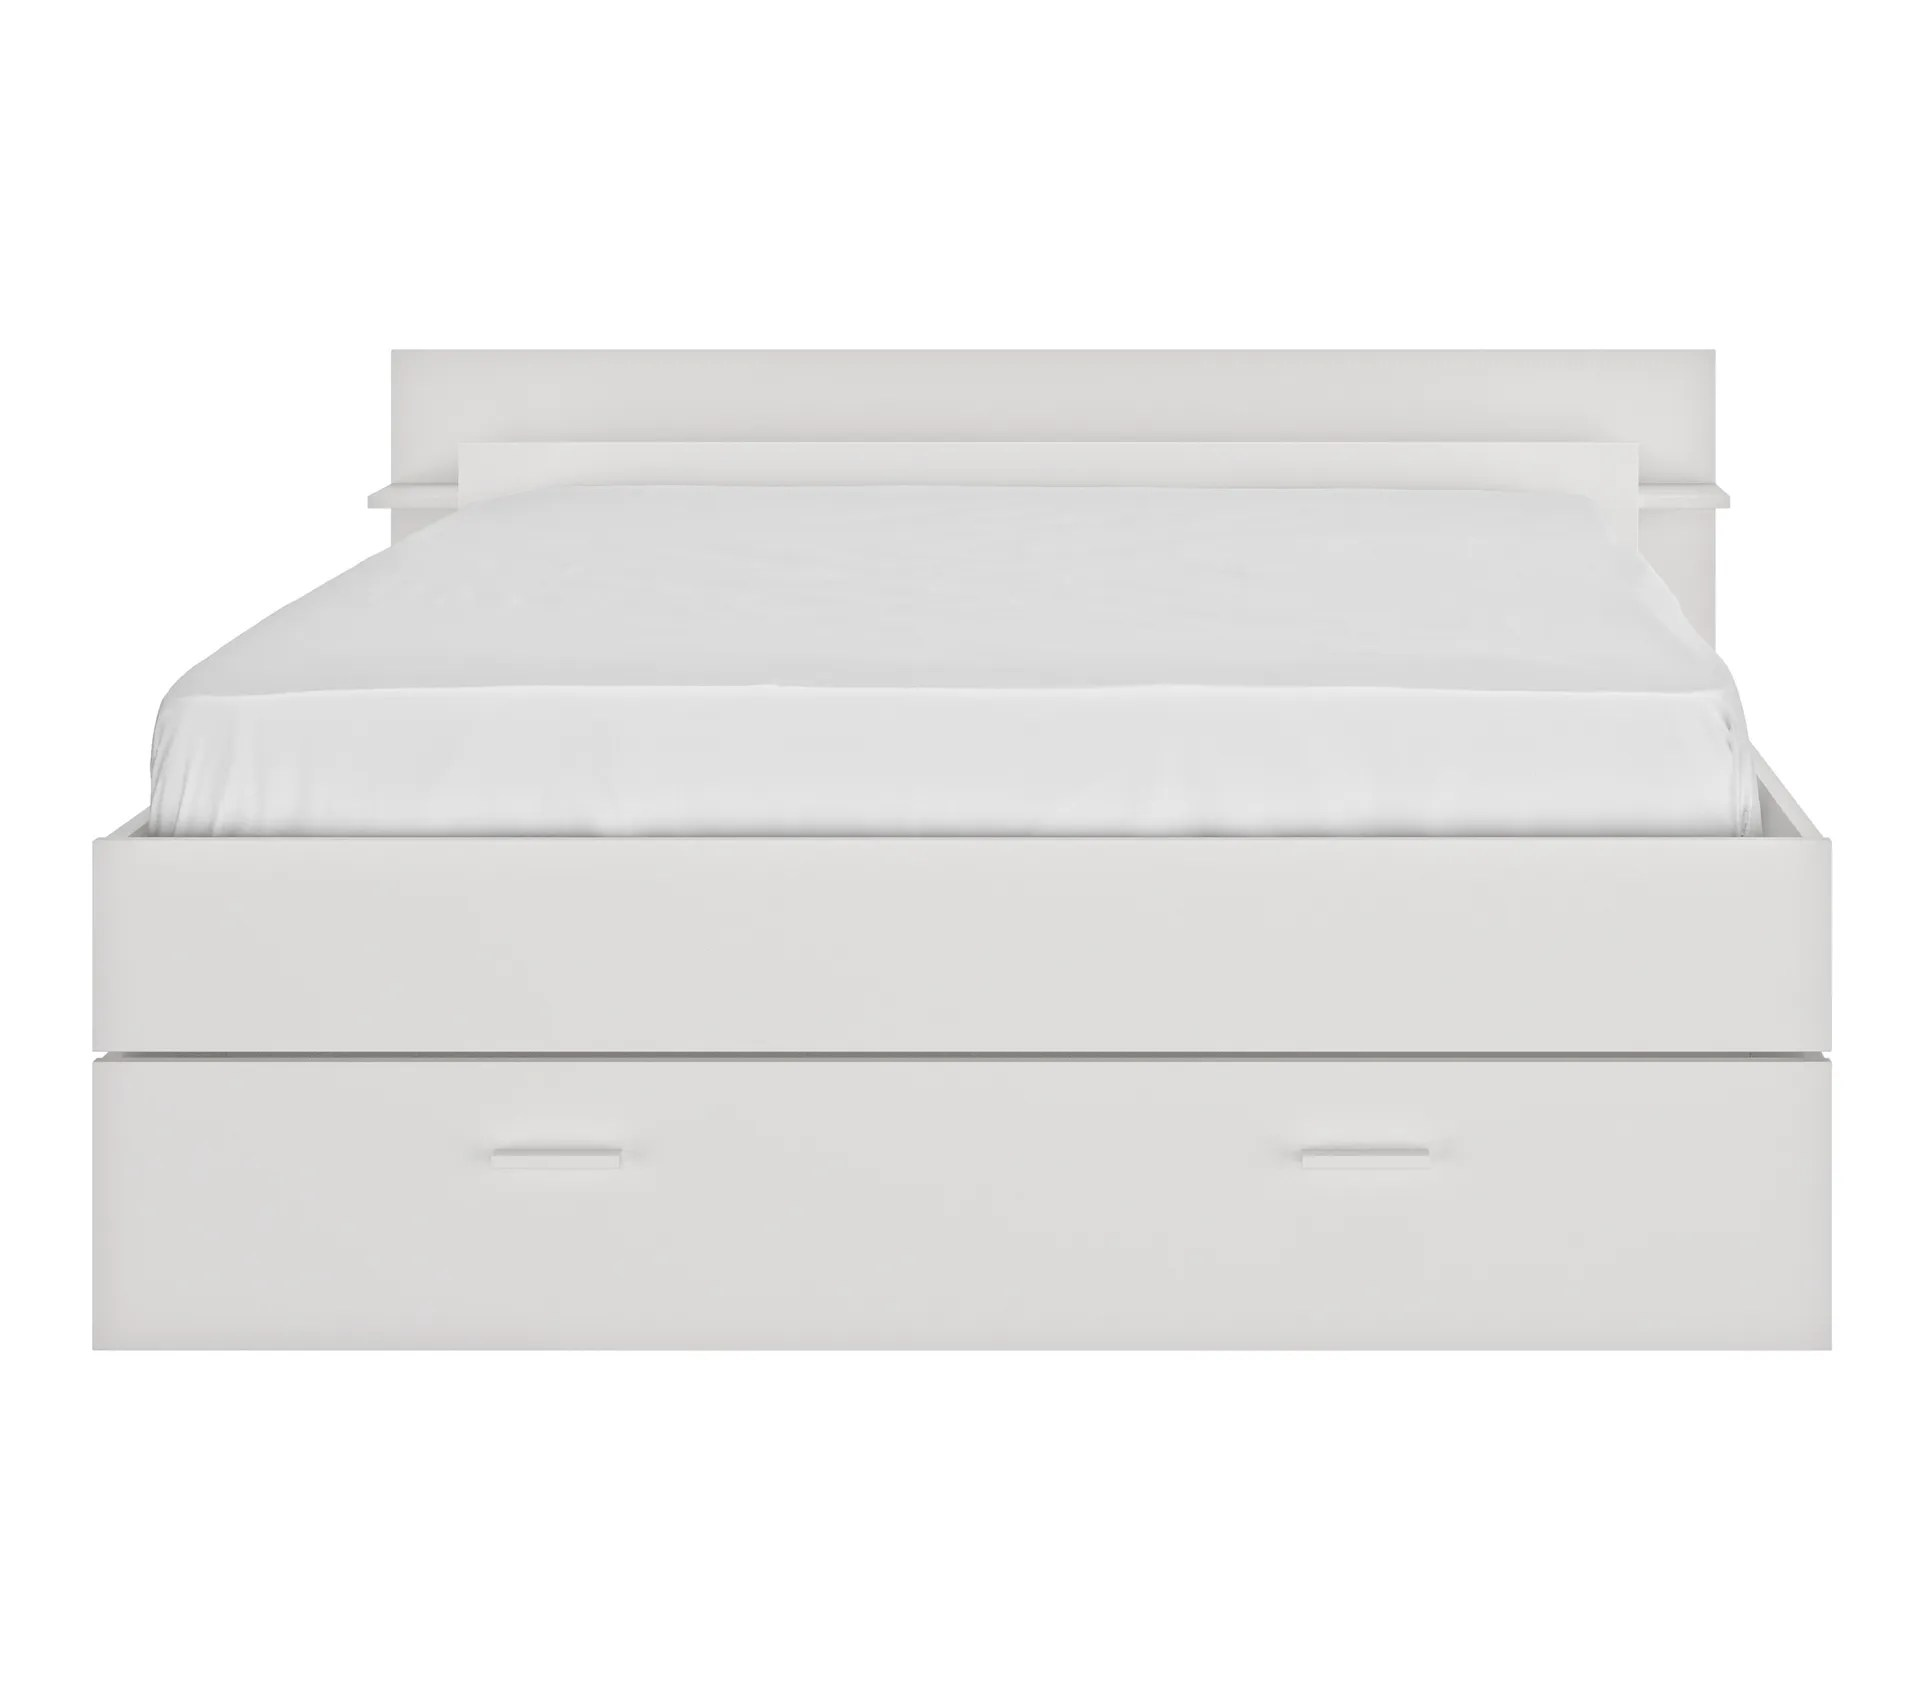 lit avec rangements 140x190 cm tonight blanc